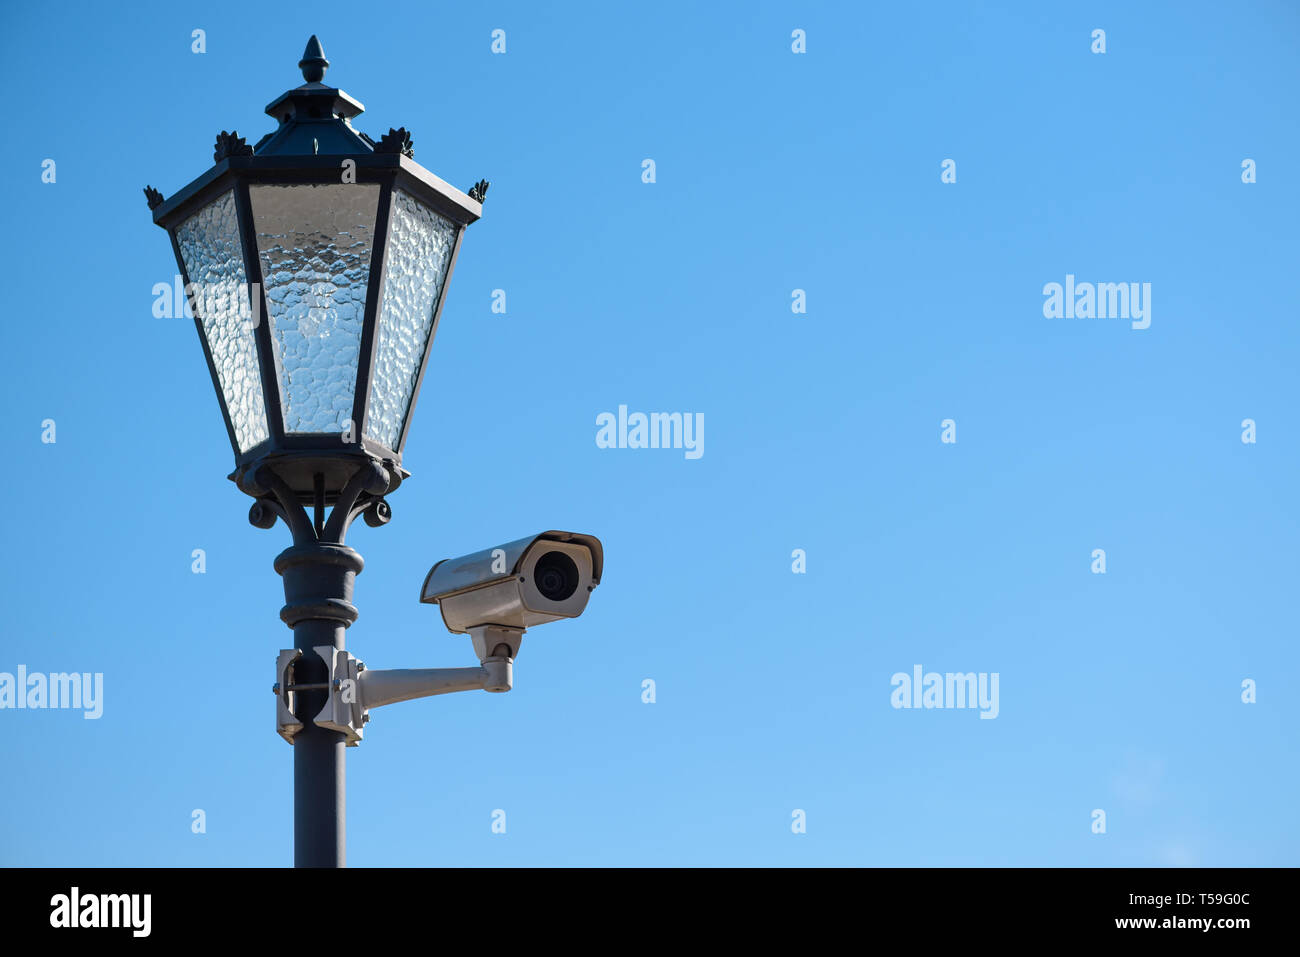 CCTV surveillance camera mounted on vintage street lantern over blue sky background - Stock Image